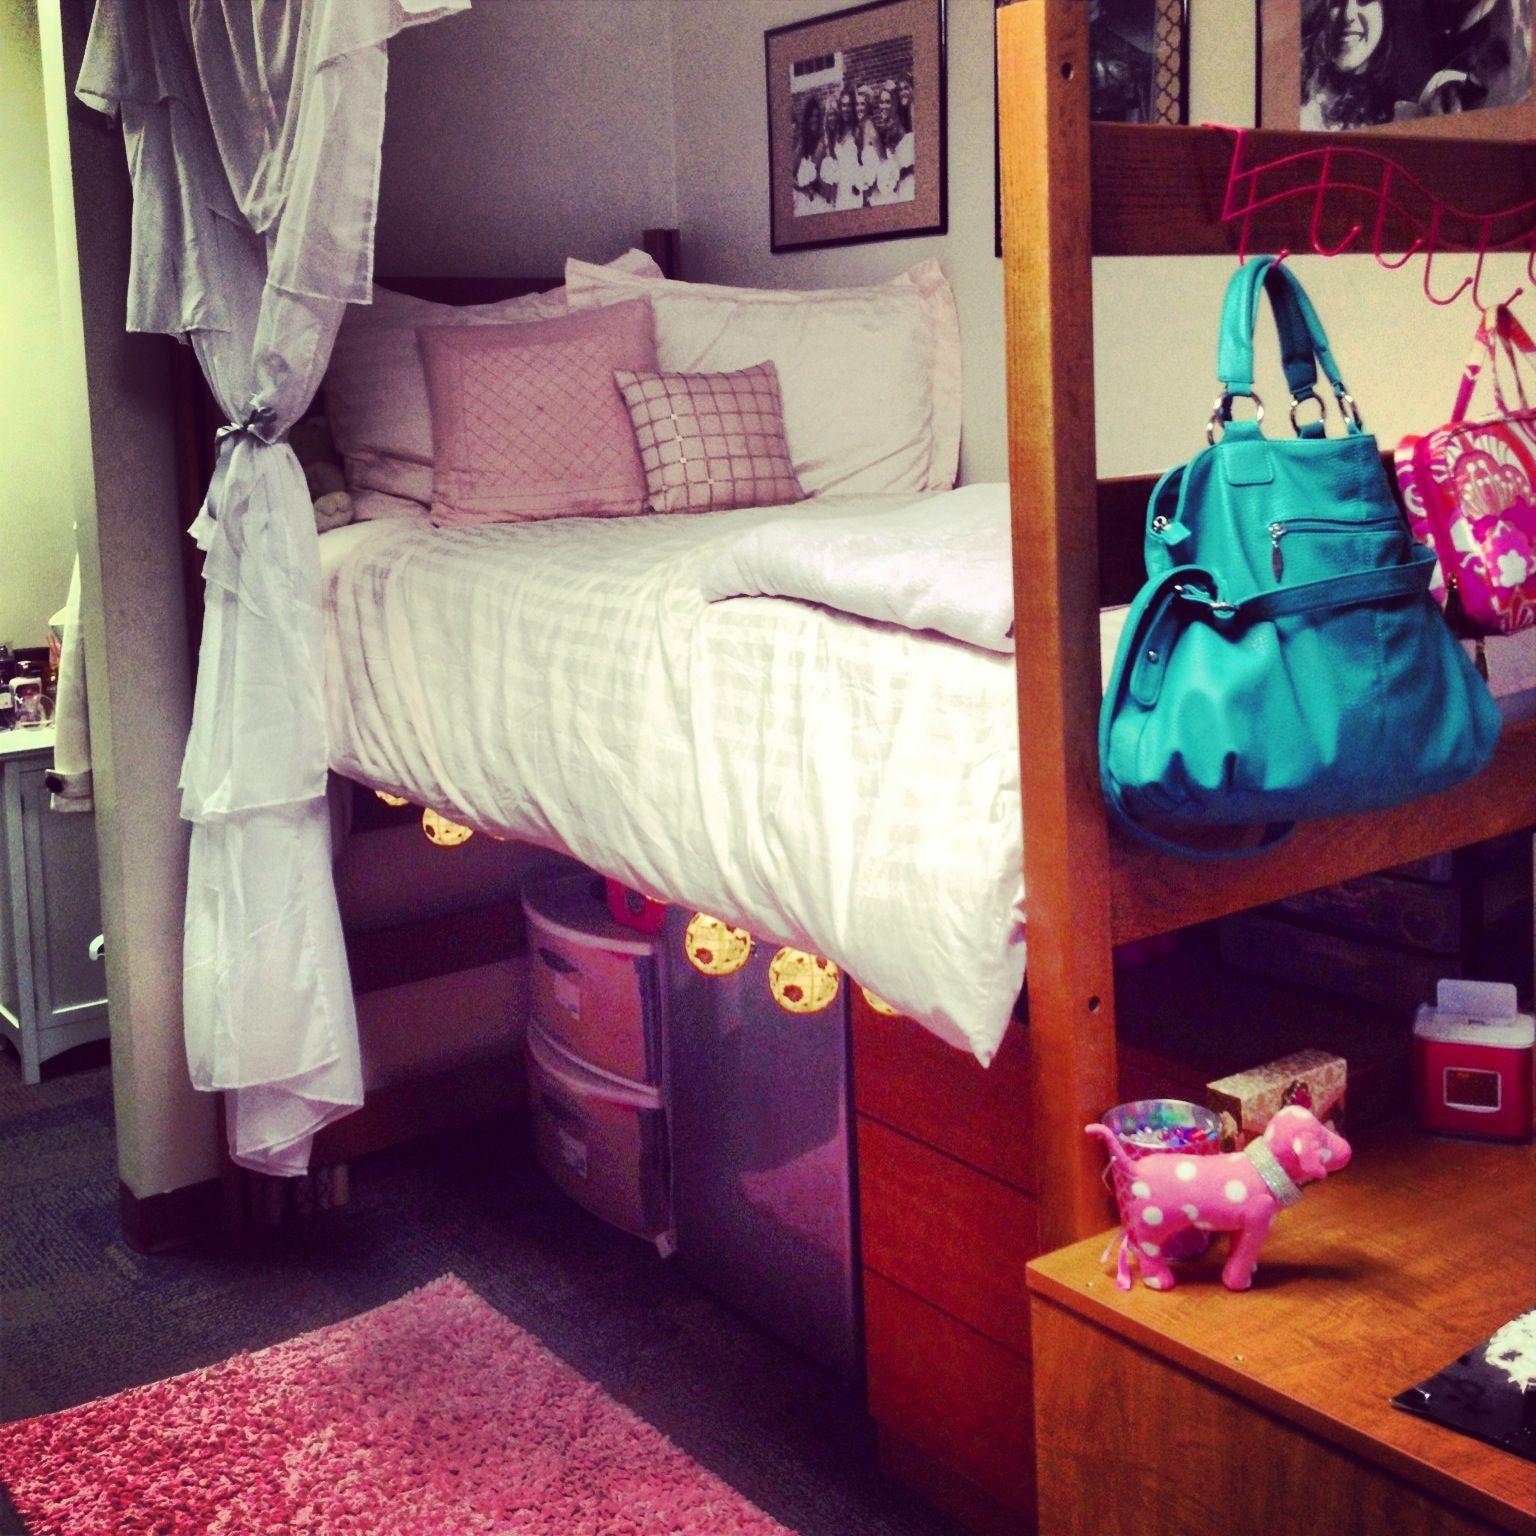 College dorm loft bed ideas  Cheap dorm decor I love the cute curtain for privacy  COLLEGE